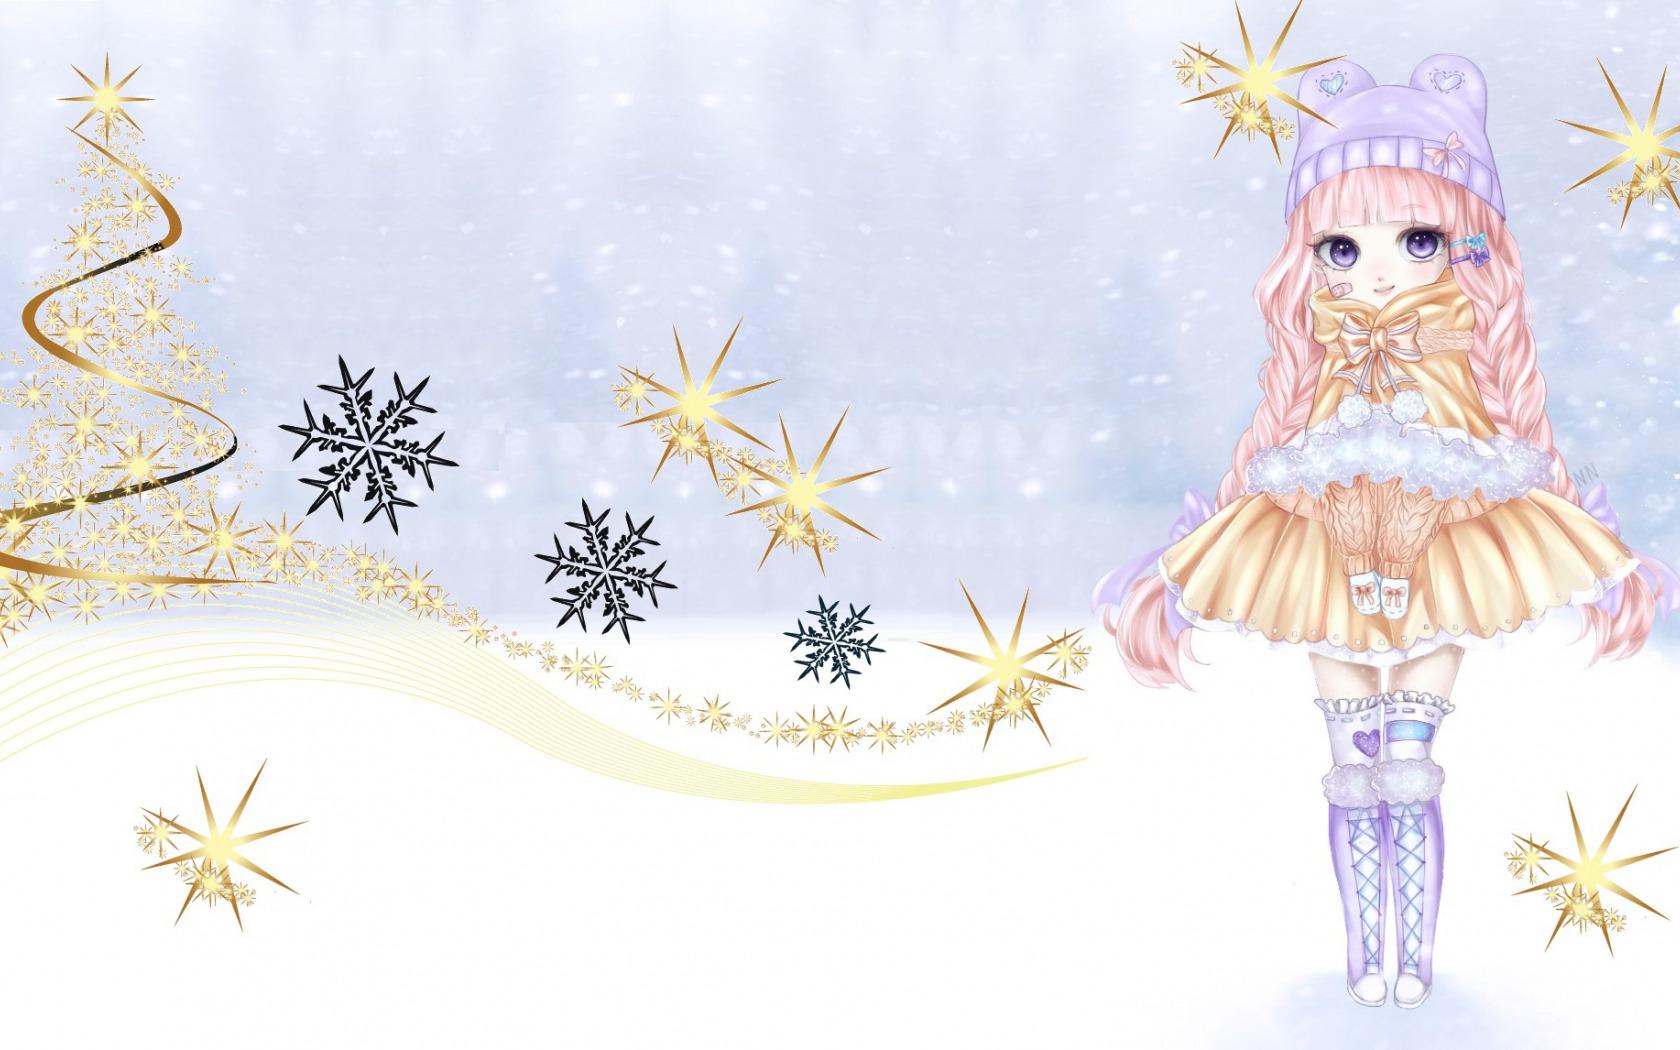 Открытки для, картинки девочки снежинки